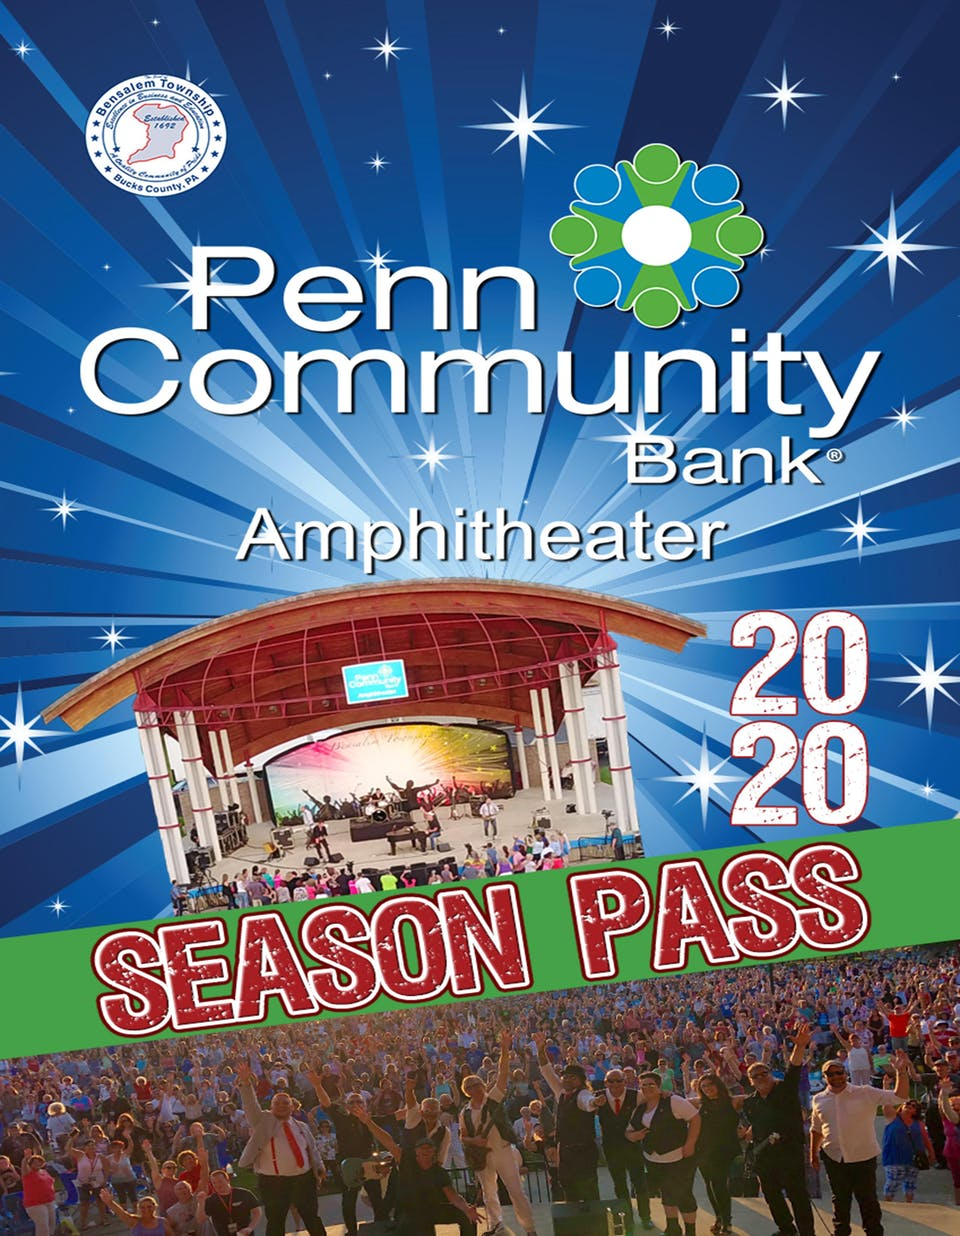 Penn Community Bank Amphitheater 2020 SEASON PASS